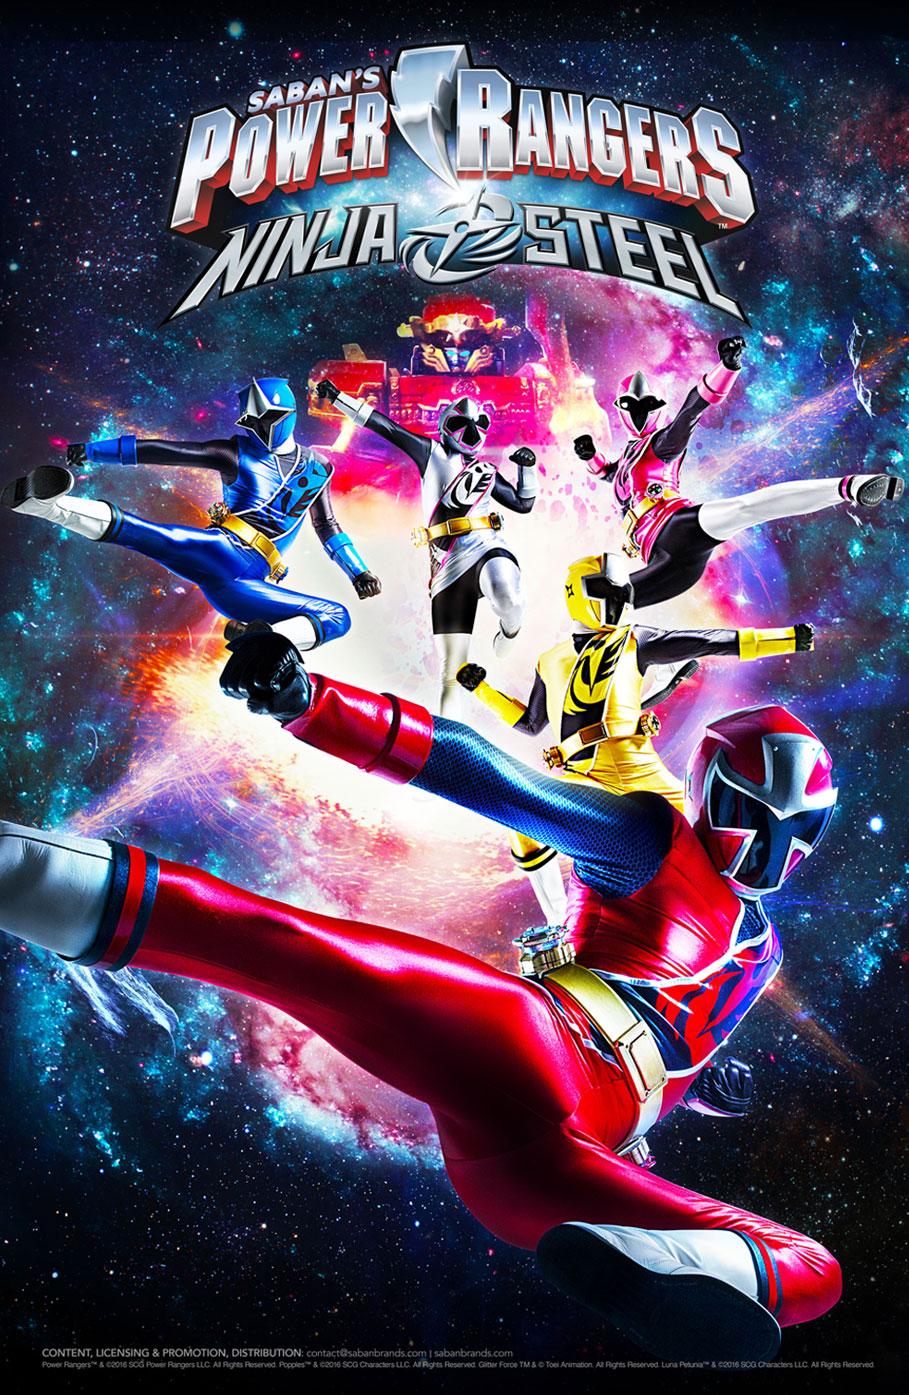 Power_Rangers_Ninja_Steel_Poster.jpg